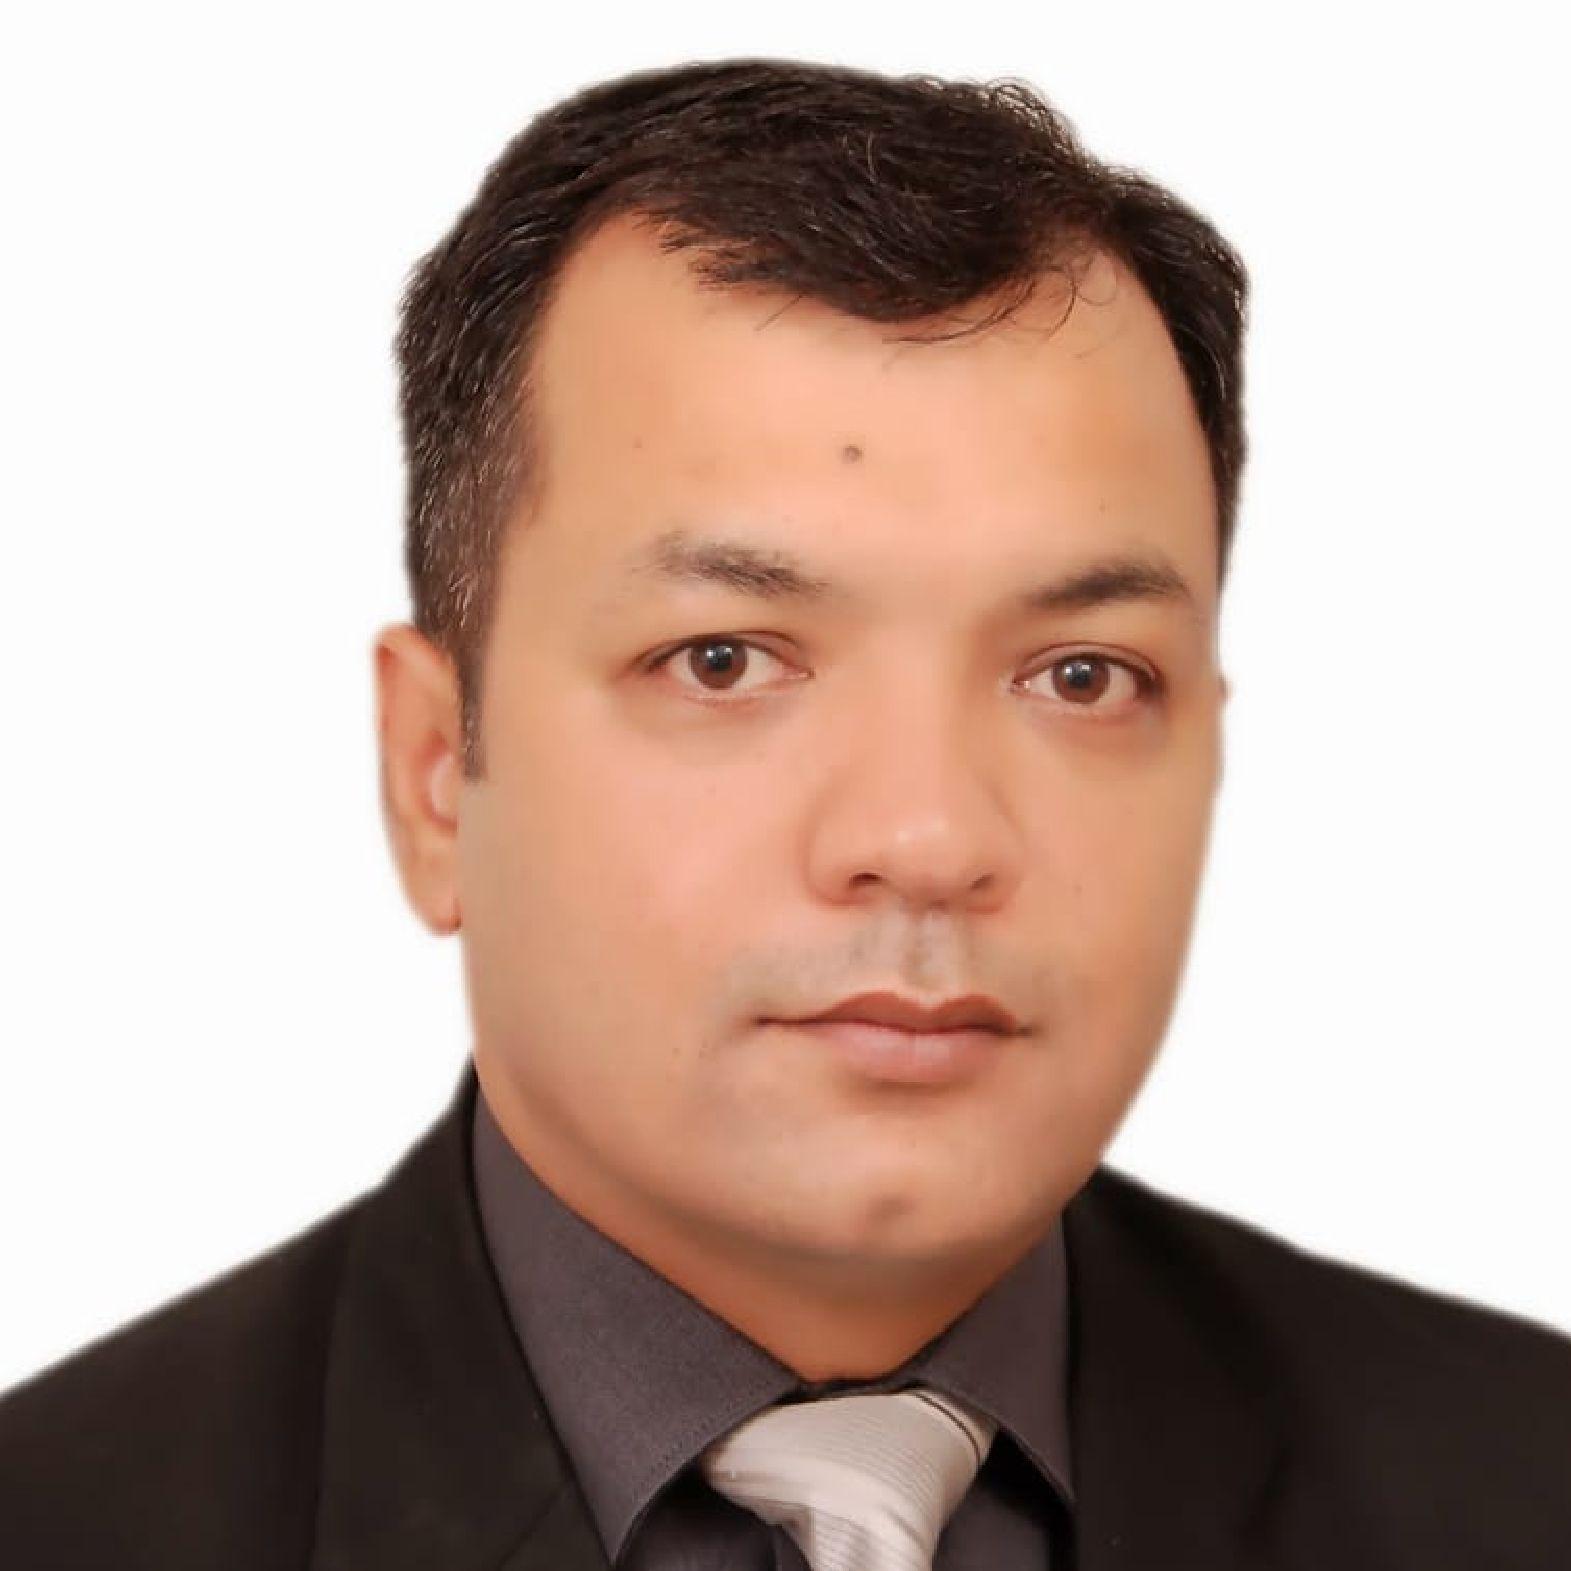 Amit Pachauri